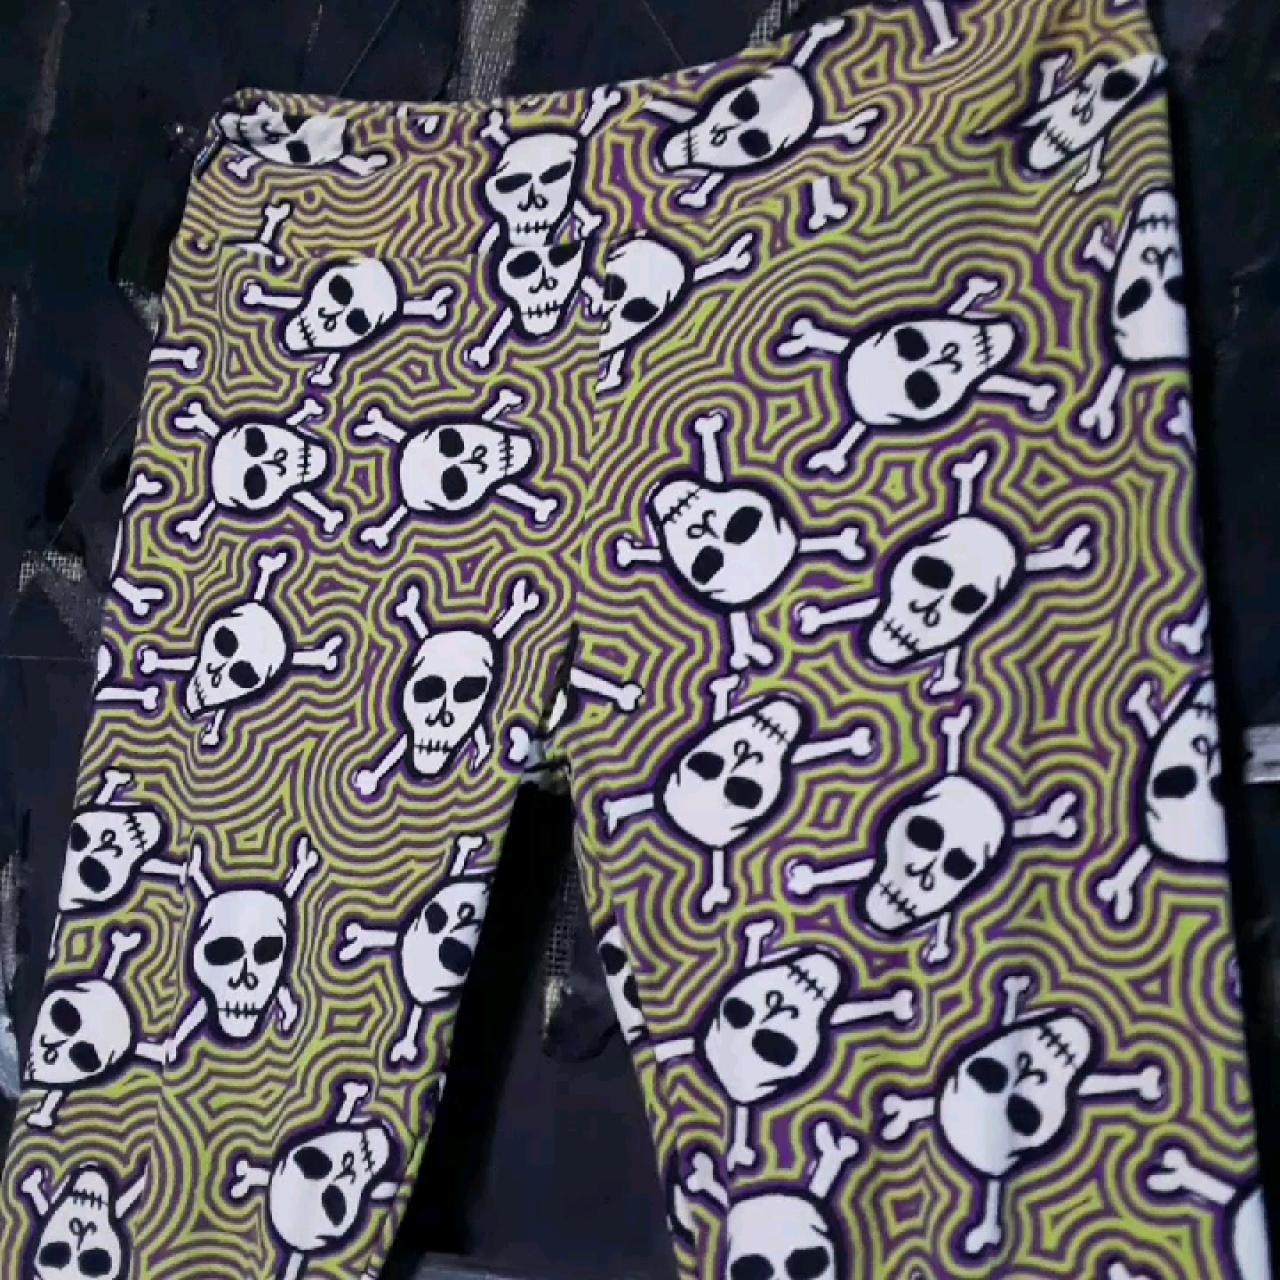 36b9ea43ceaf22 Lularoe skull leggings. Size TC tall and curvy. Super soft - Depop